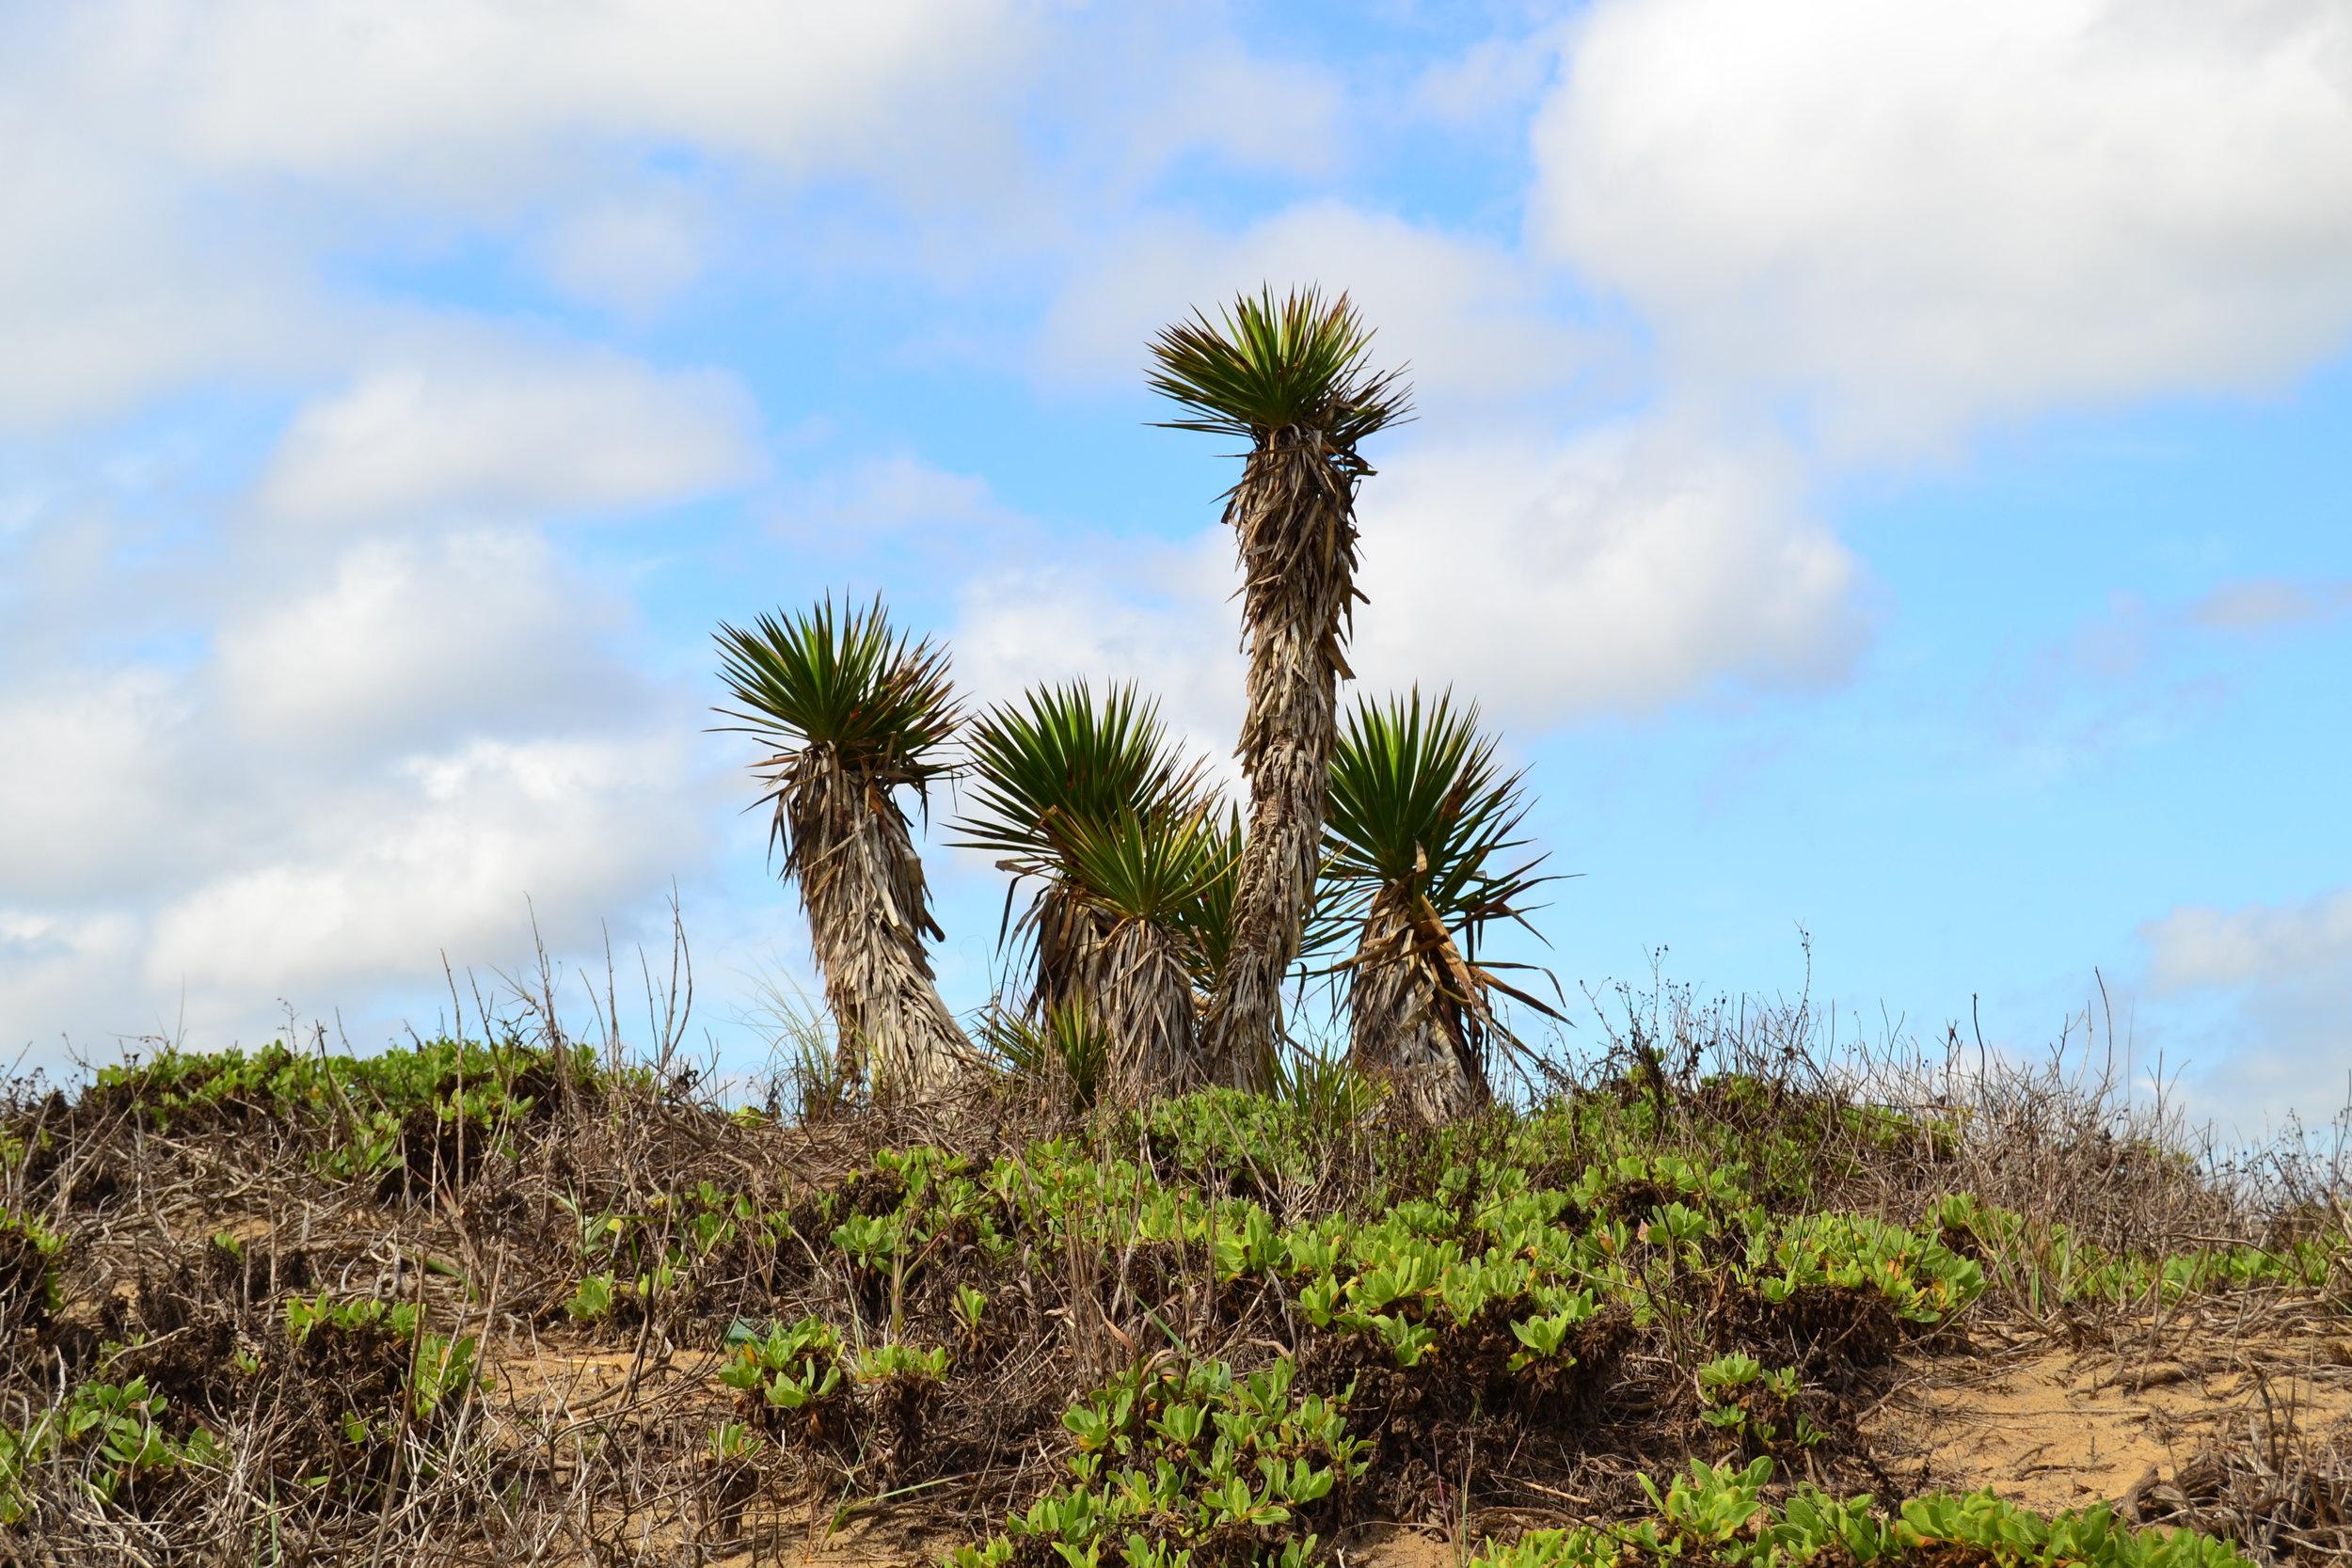 Padre Yucca/Spanish Dagger plants